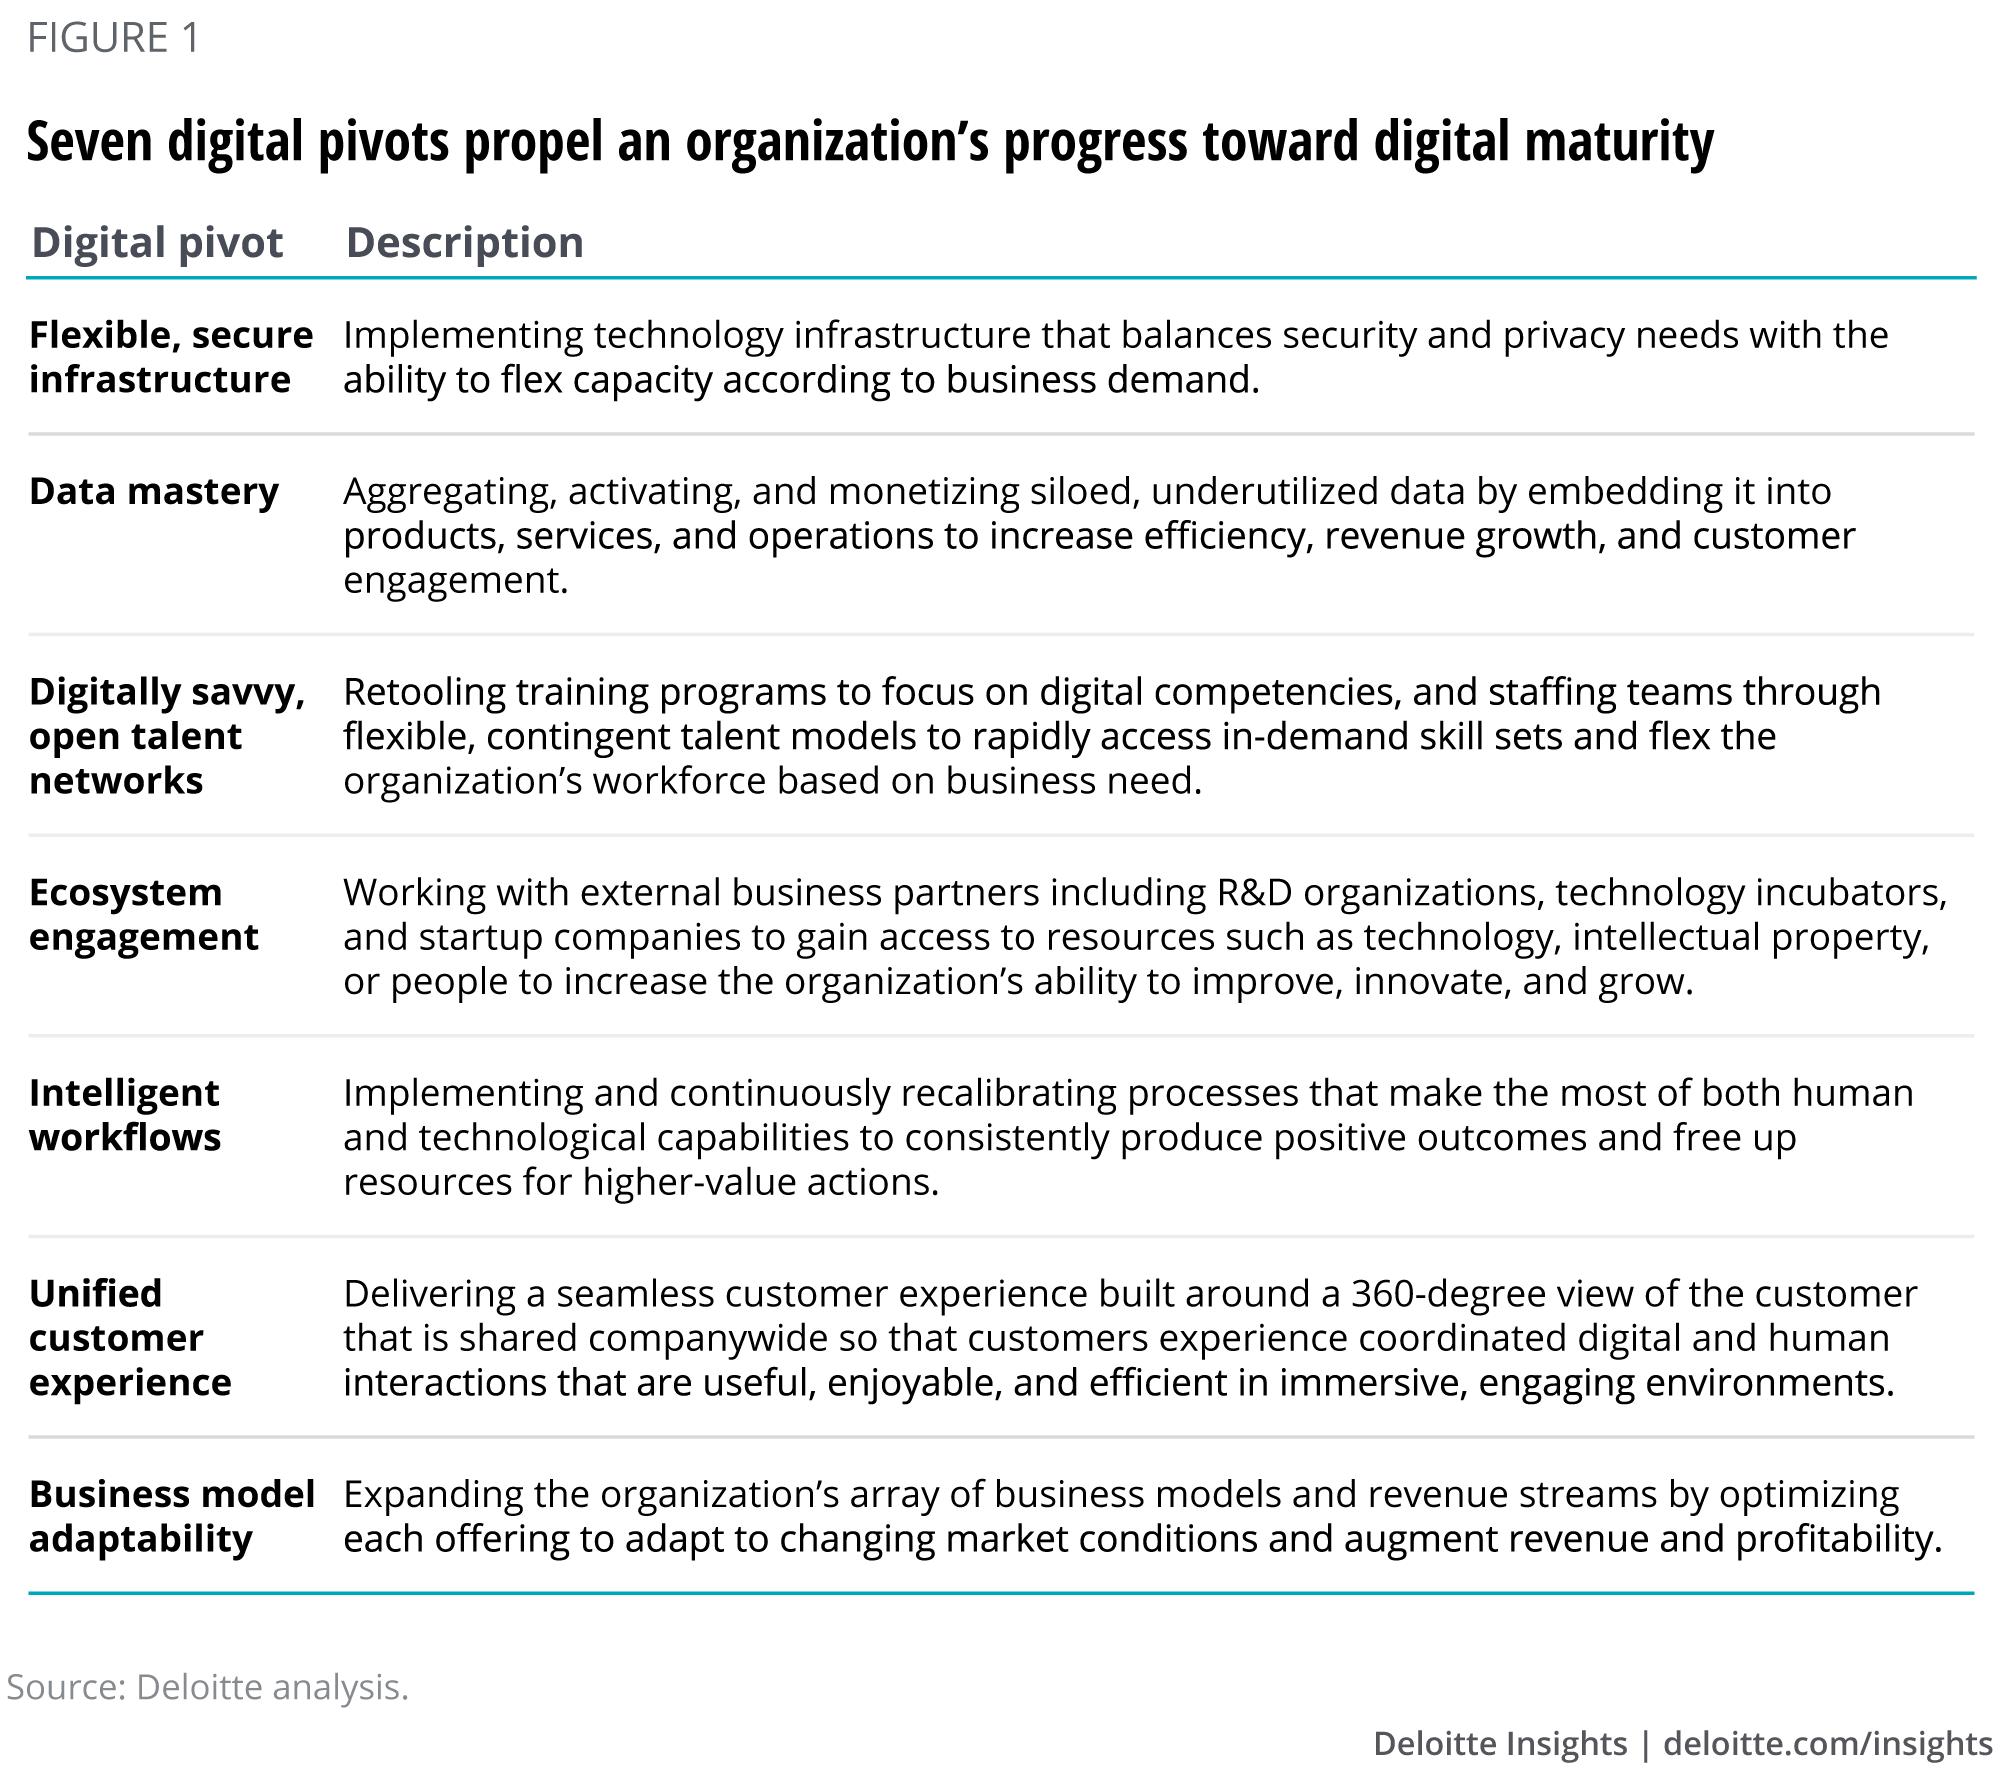 Digital Maturity Model and Digital Pivots | Deloitte Insights